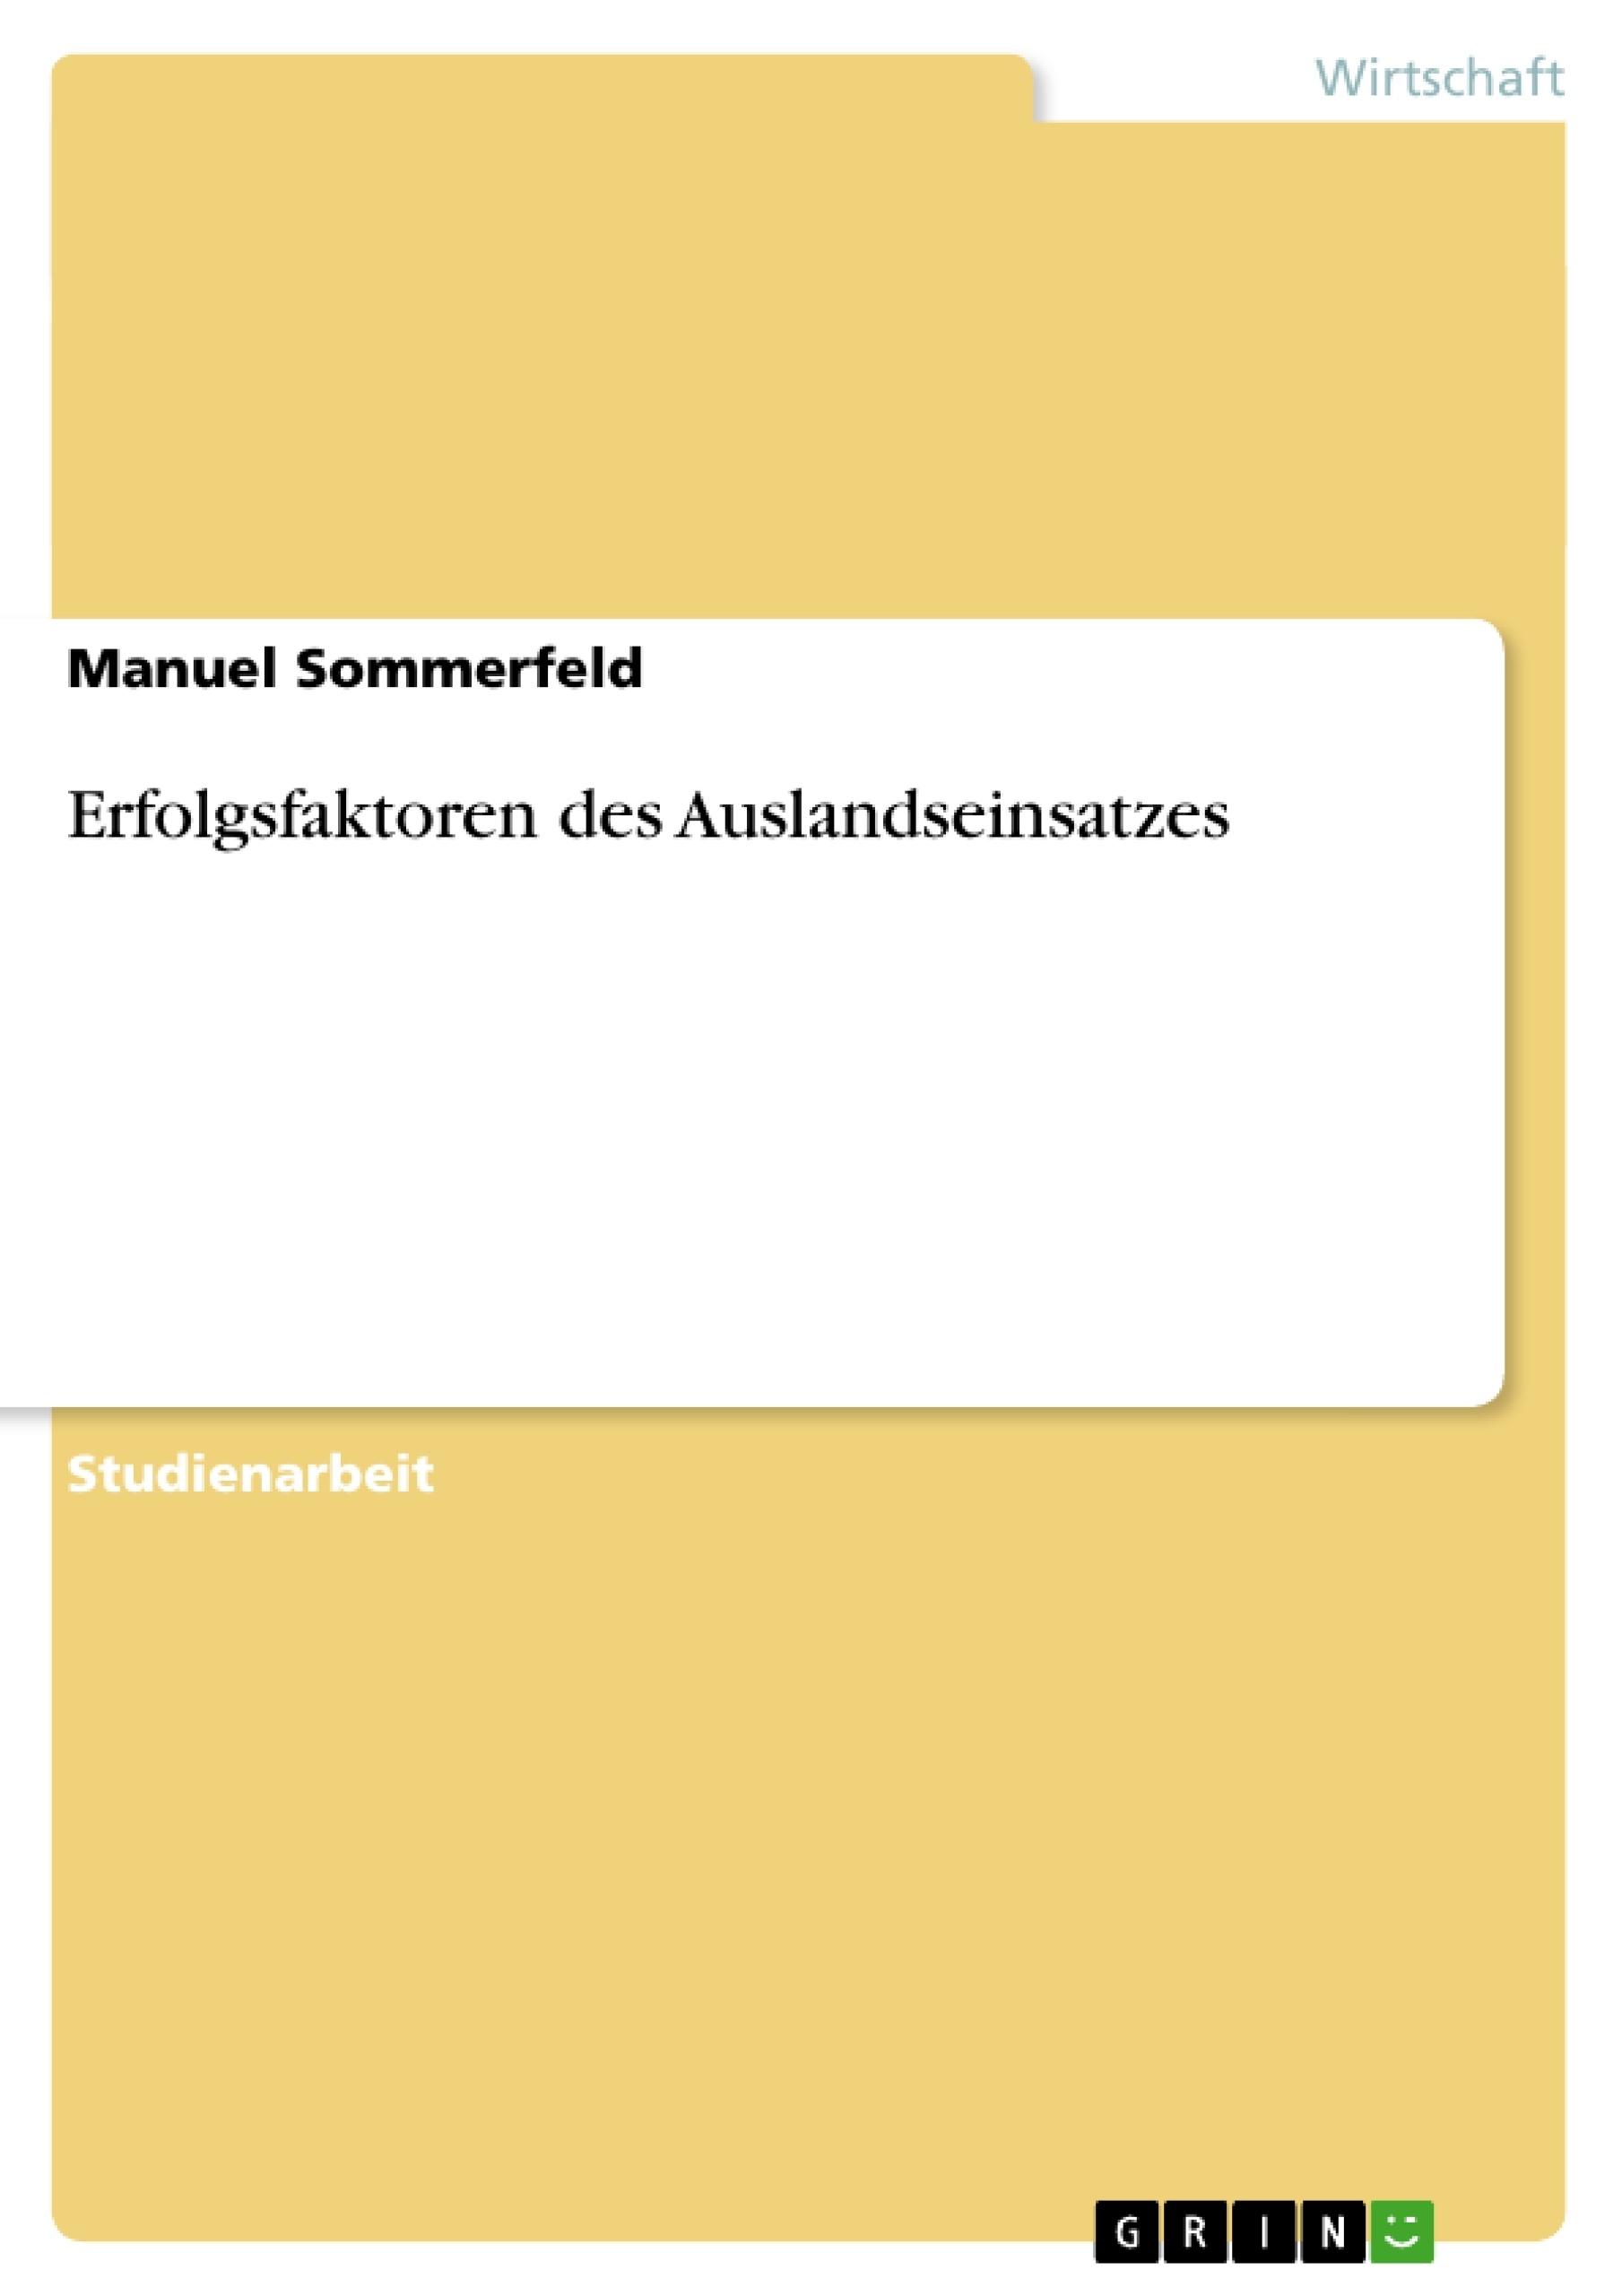 Titel: Erfolgsfaktoren des Auslandseinsatzes